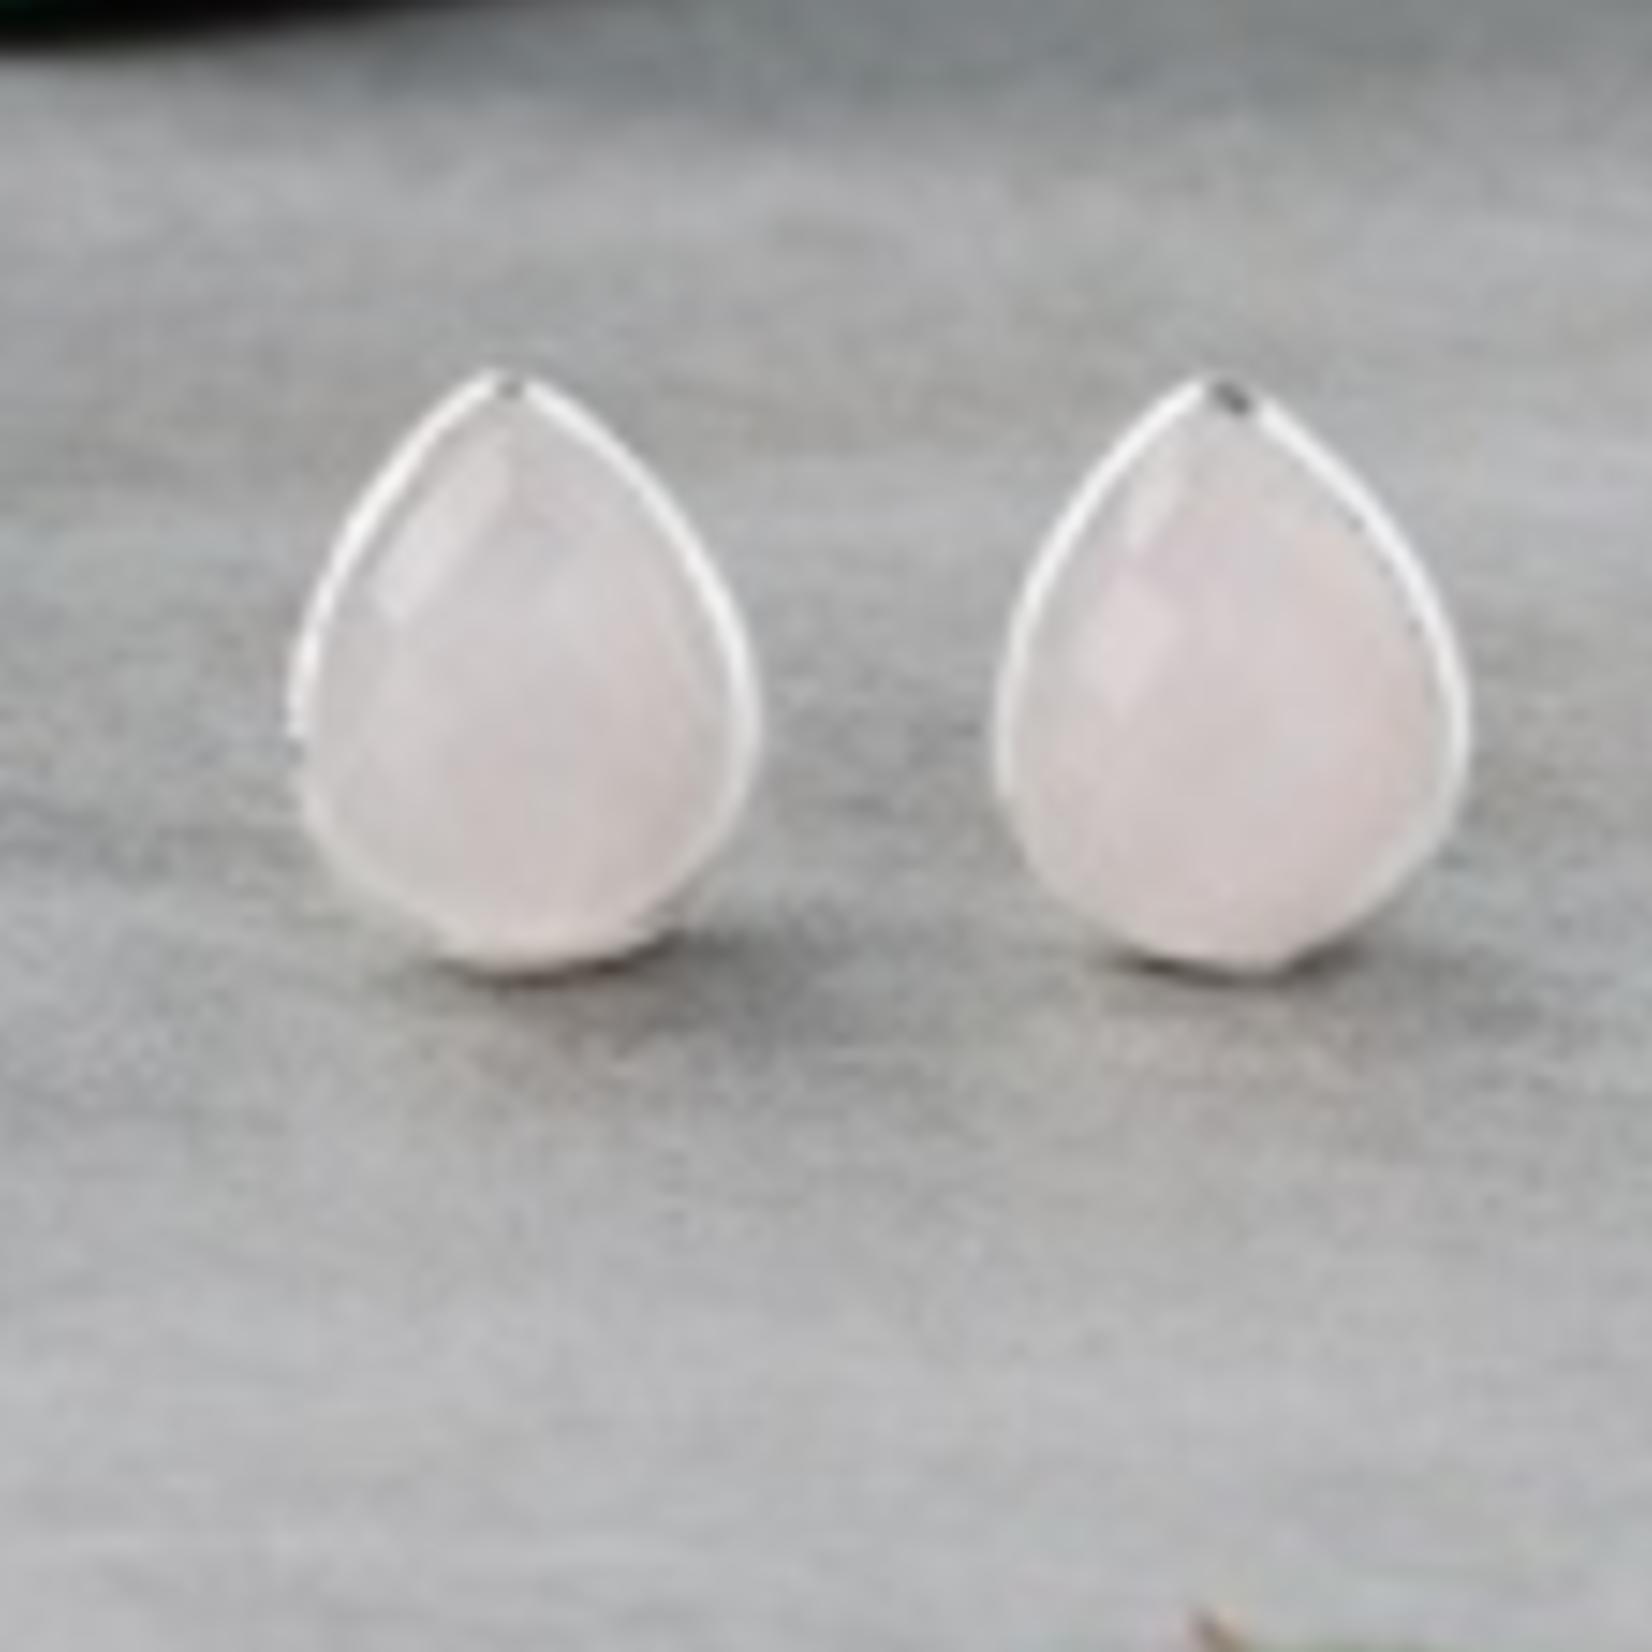 Crown Stud Earrings Silver/Rose Quartz